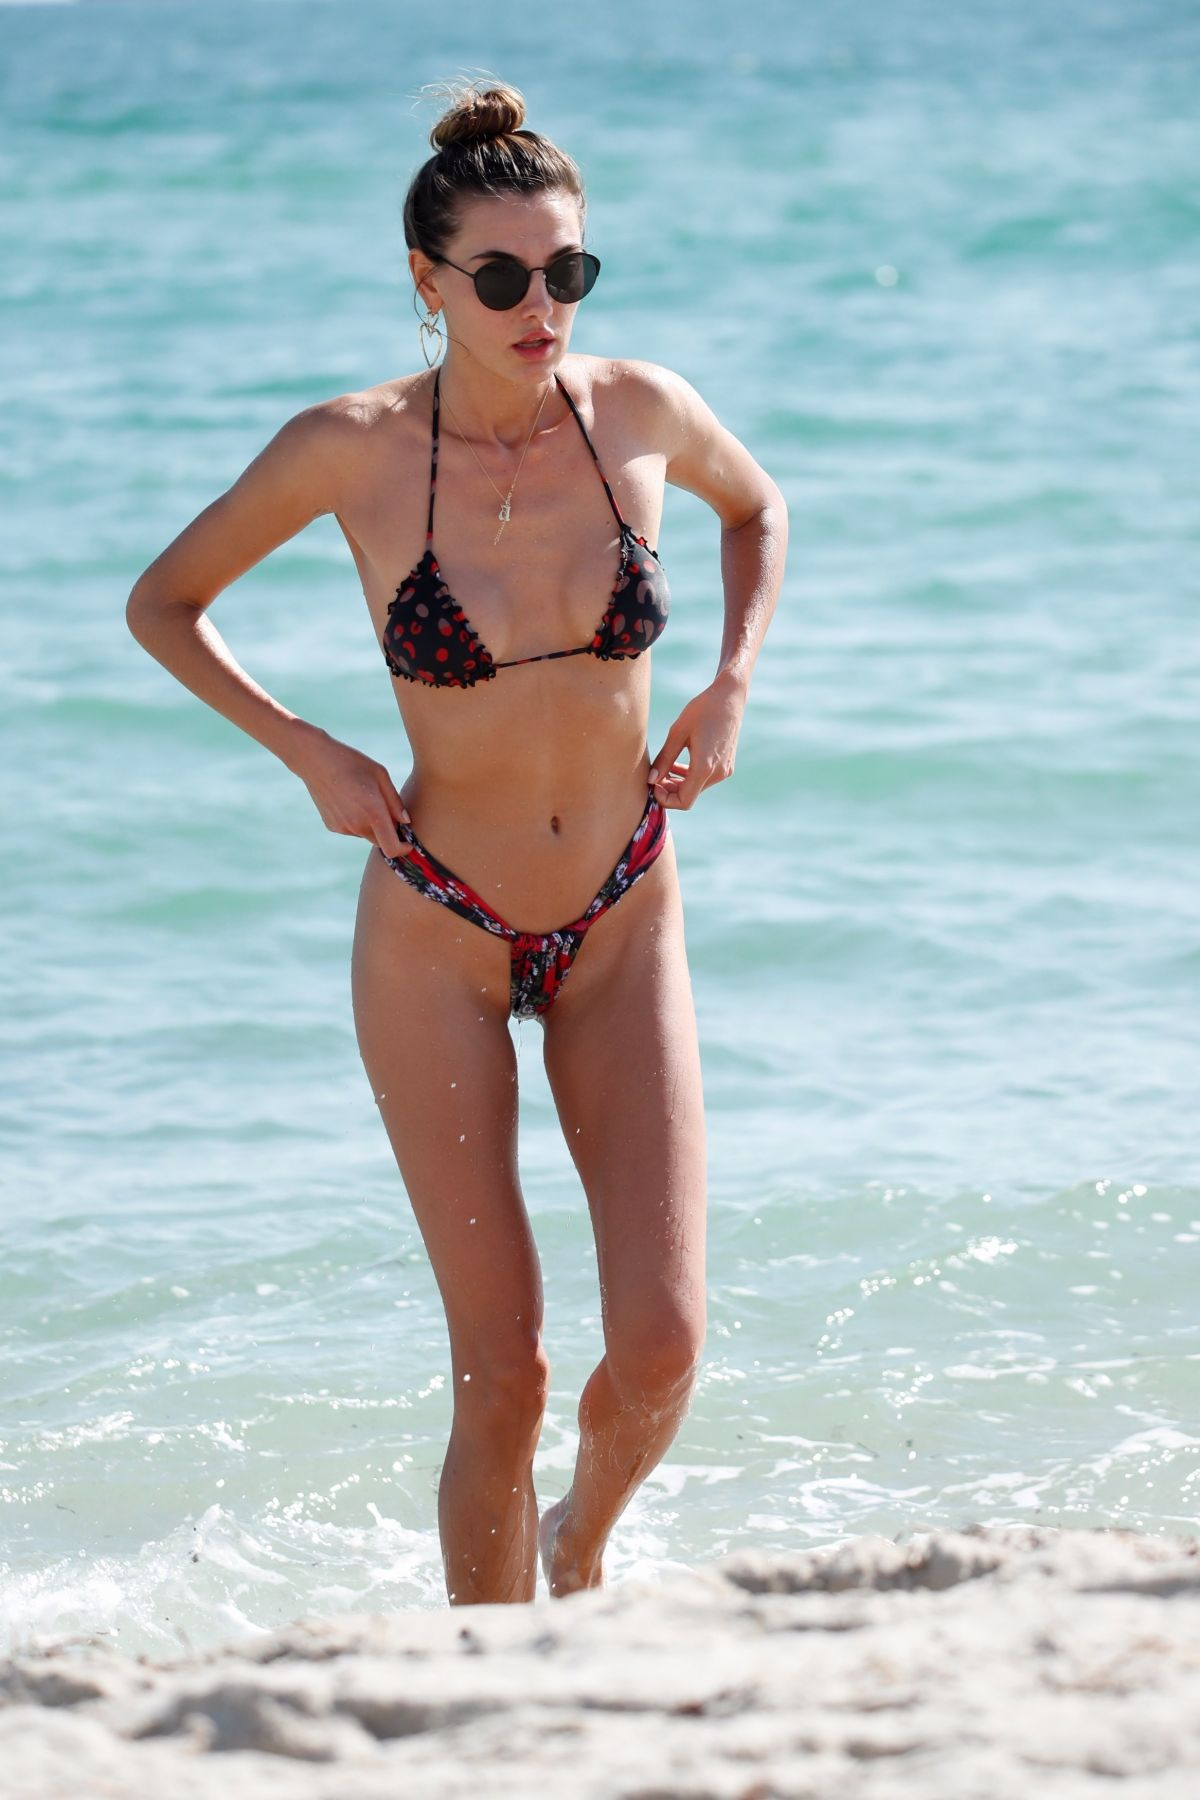 Bikini Alina nudes (16 photos), Tits, Paparazzi, Selfie, bra 2019